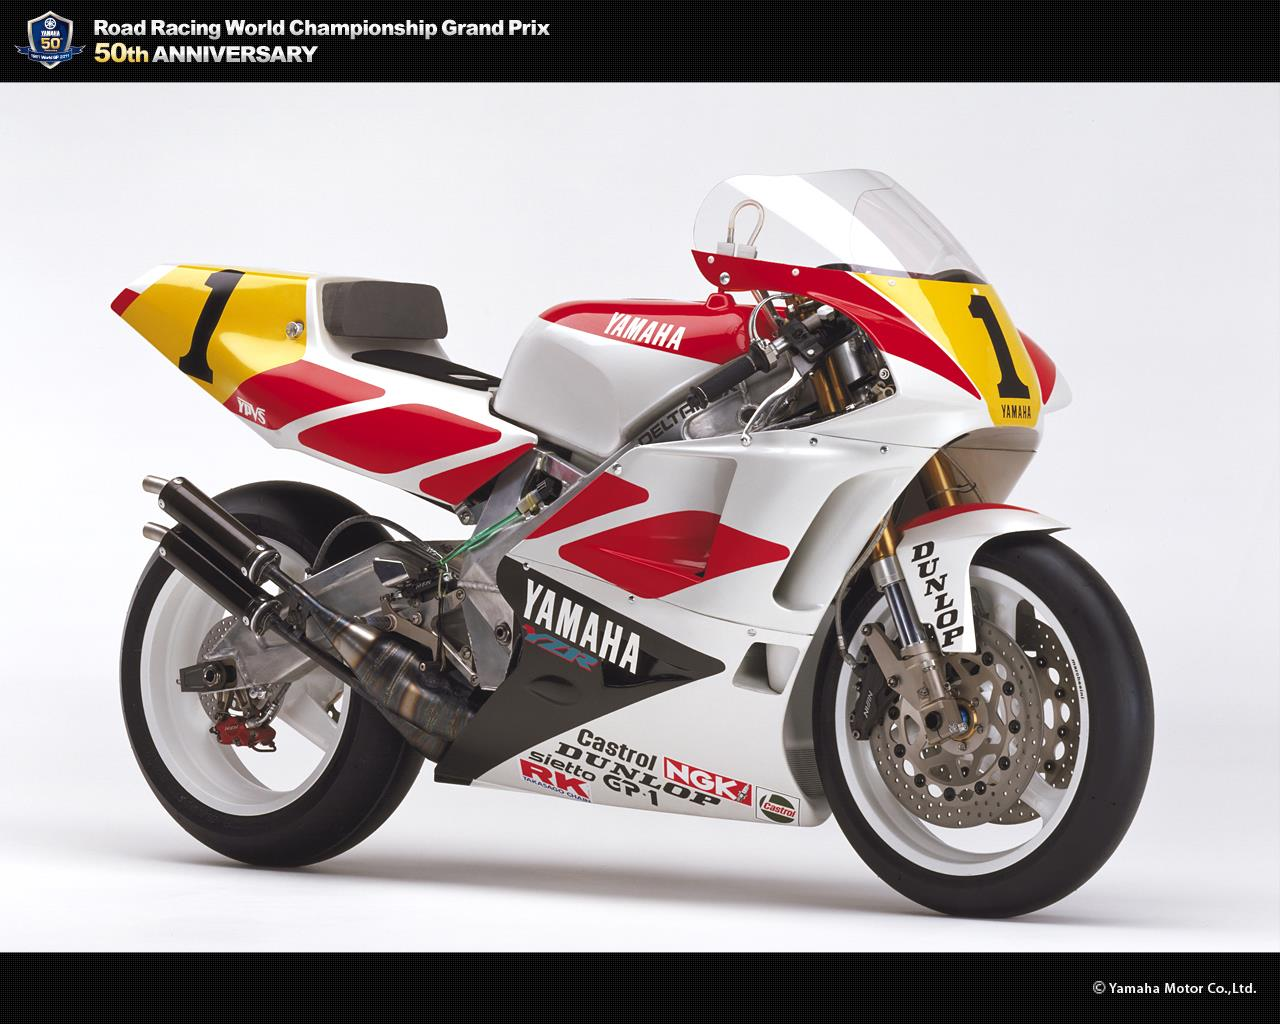 Yamaha 500cc 2 Stroke Motorcycle Race Htmlon Yamaha 250 Wiring Diagram